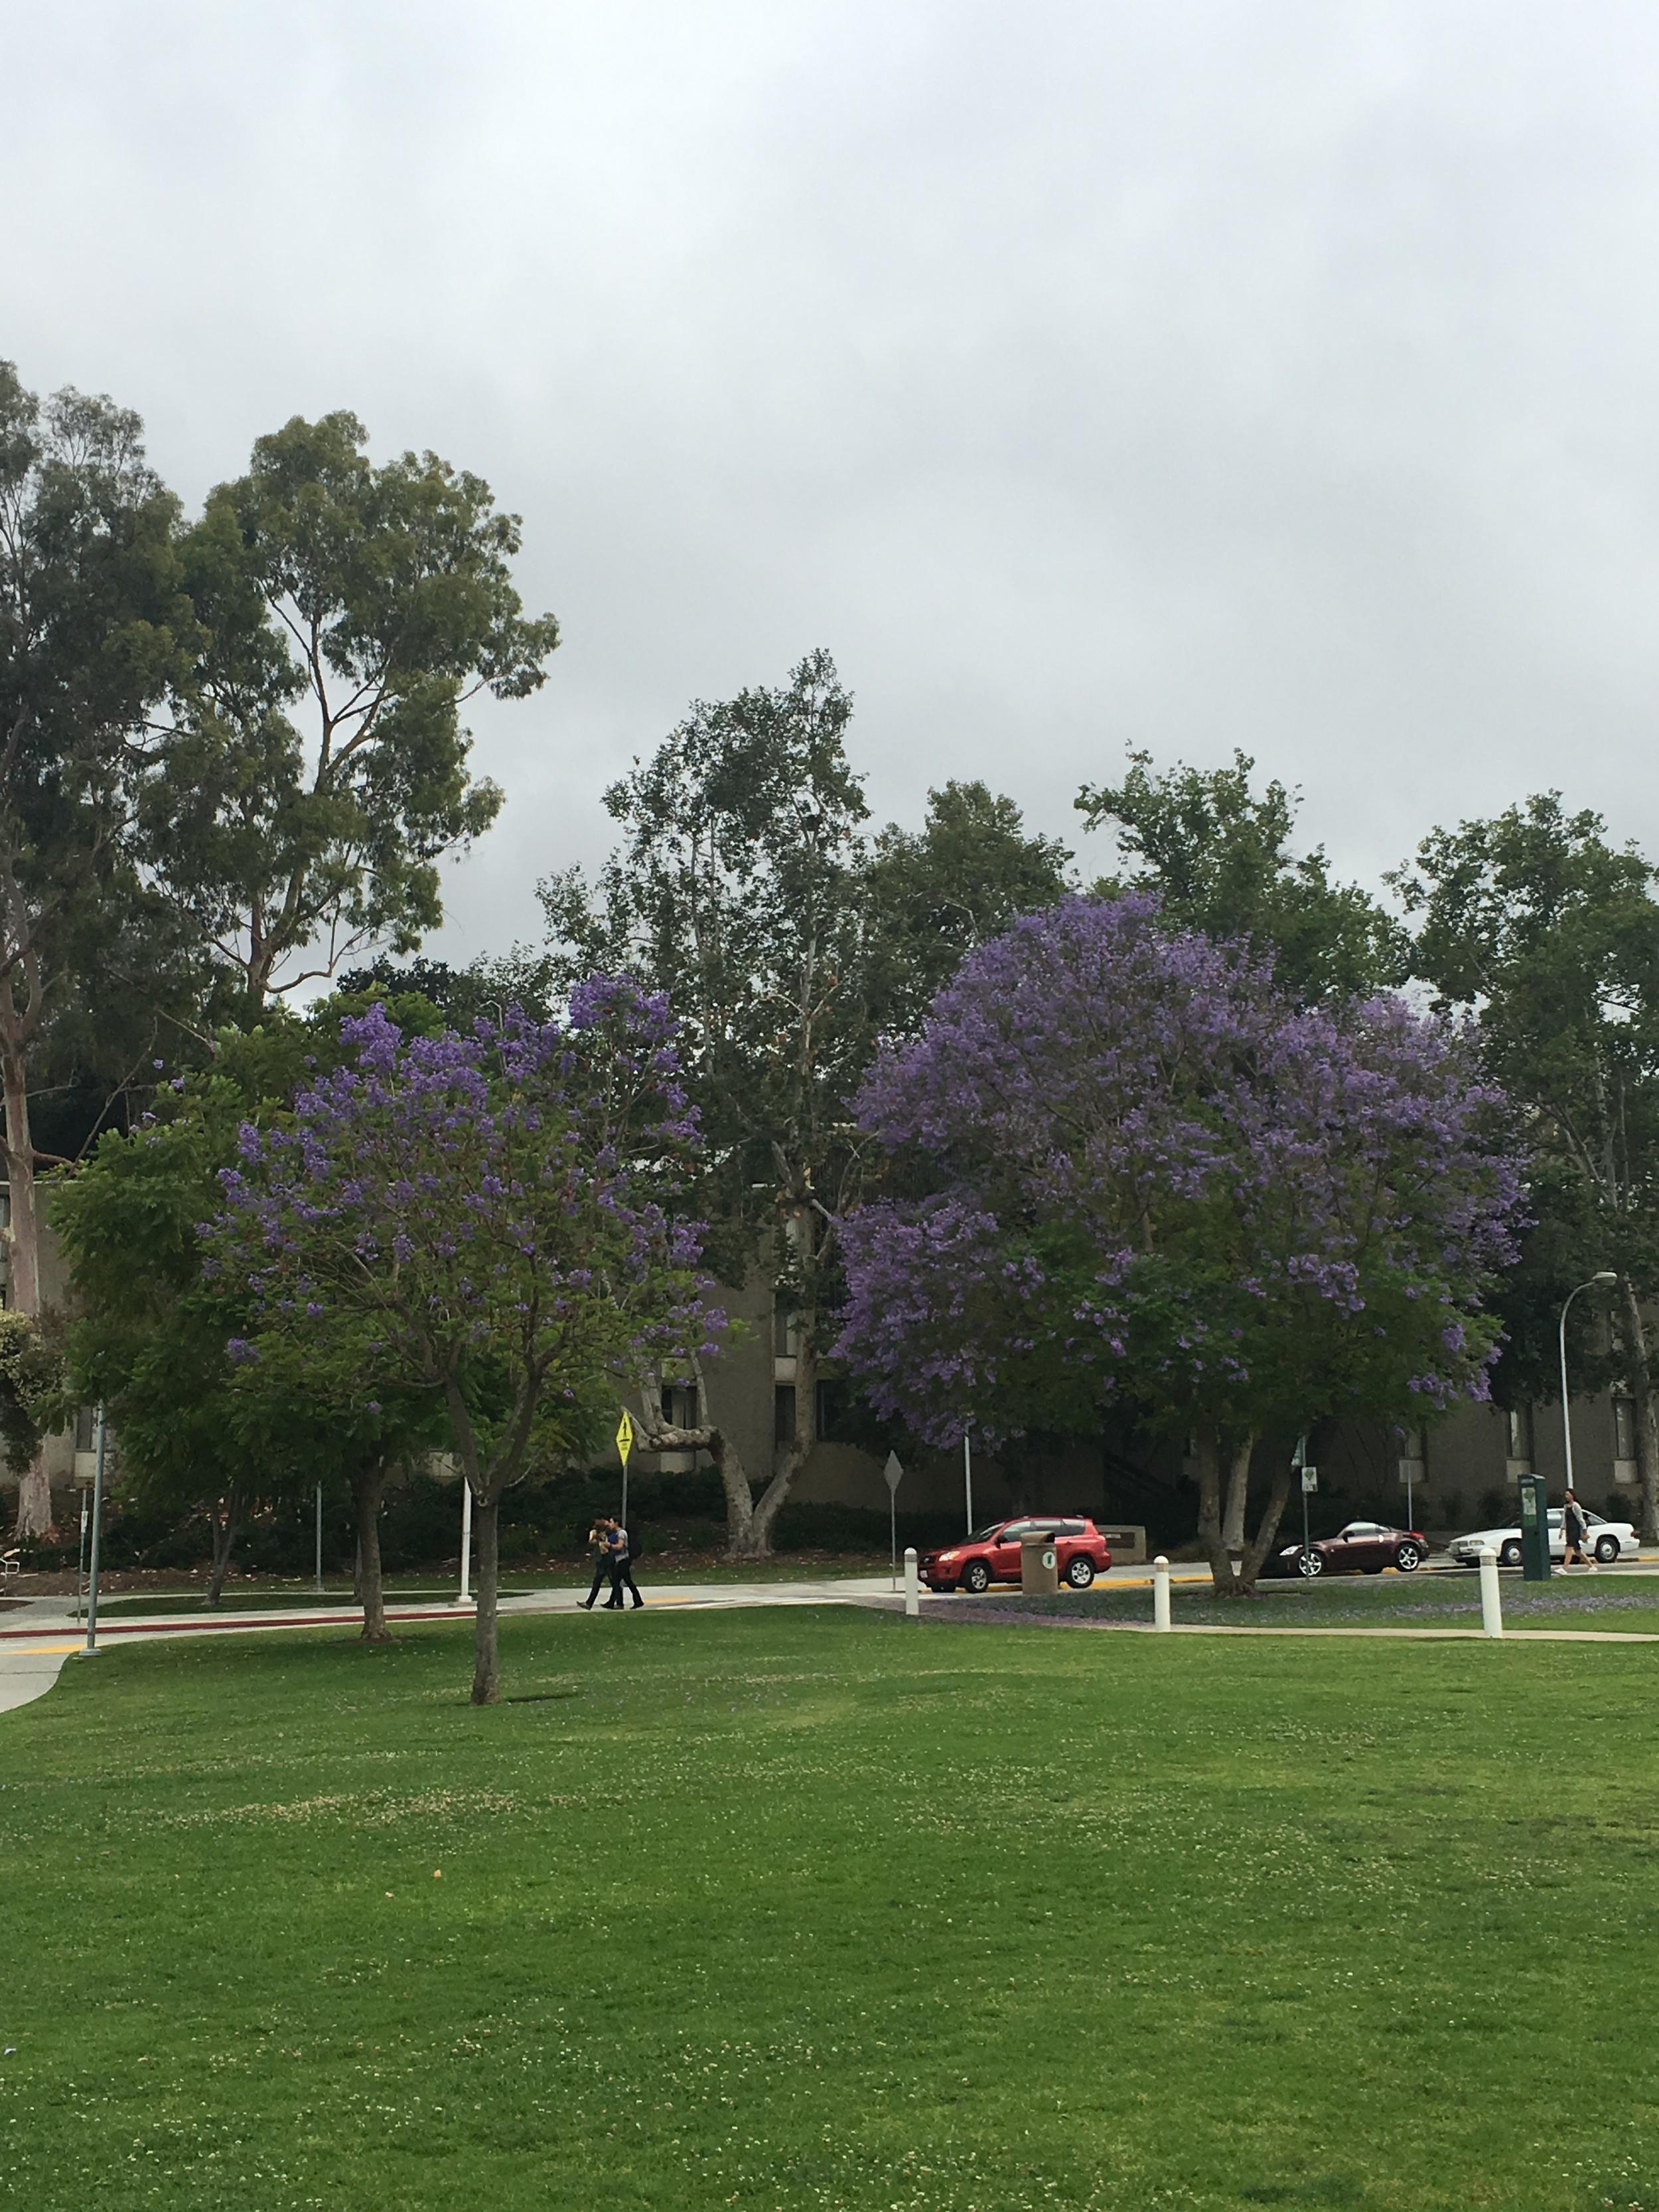 Jacarandas in bloom all around campus!